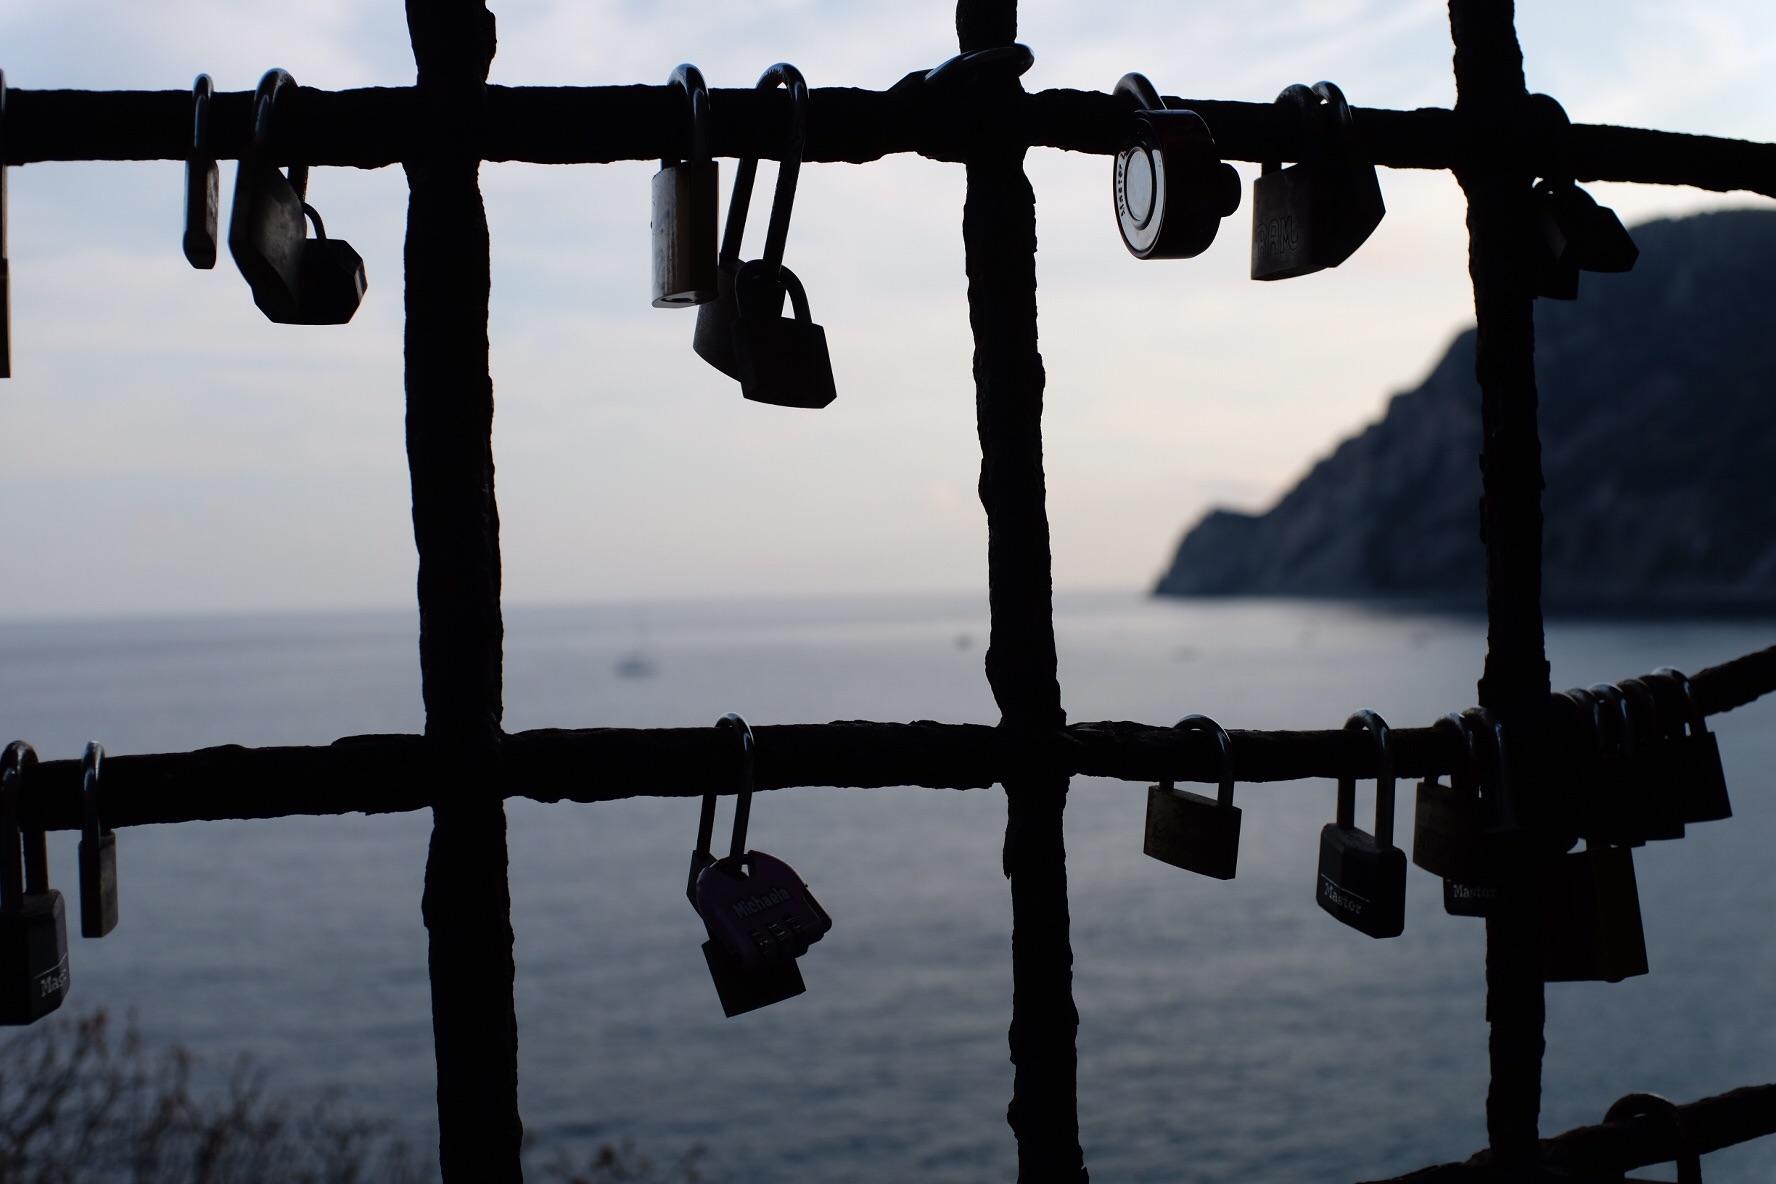 Lovers' locks high above the Ligurian Sea